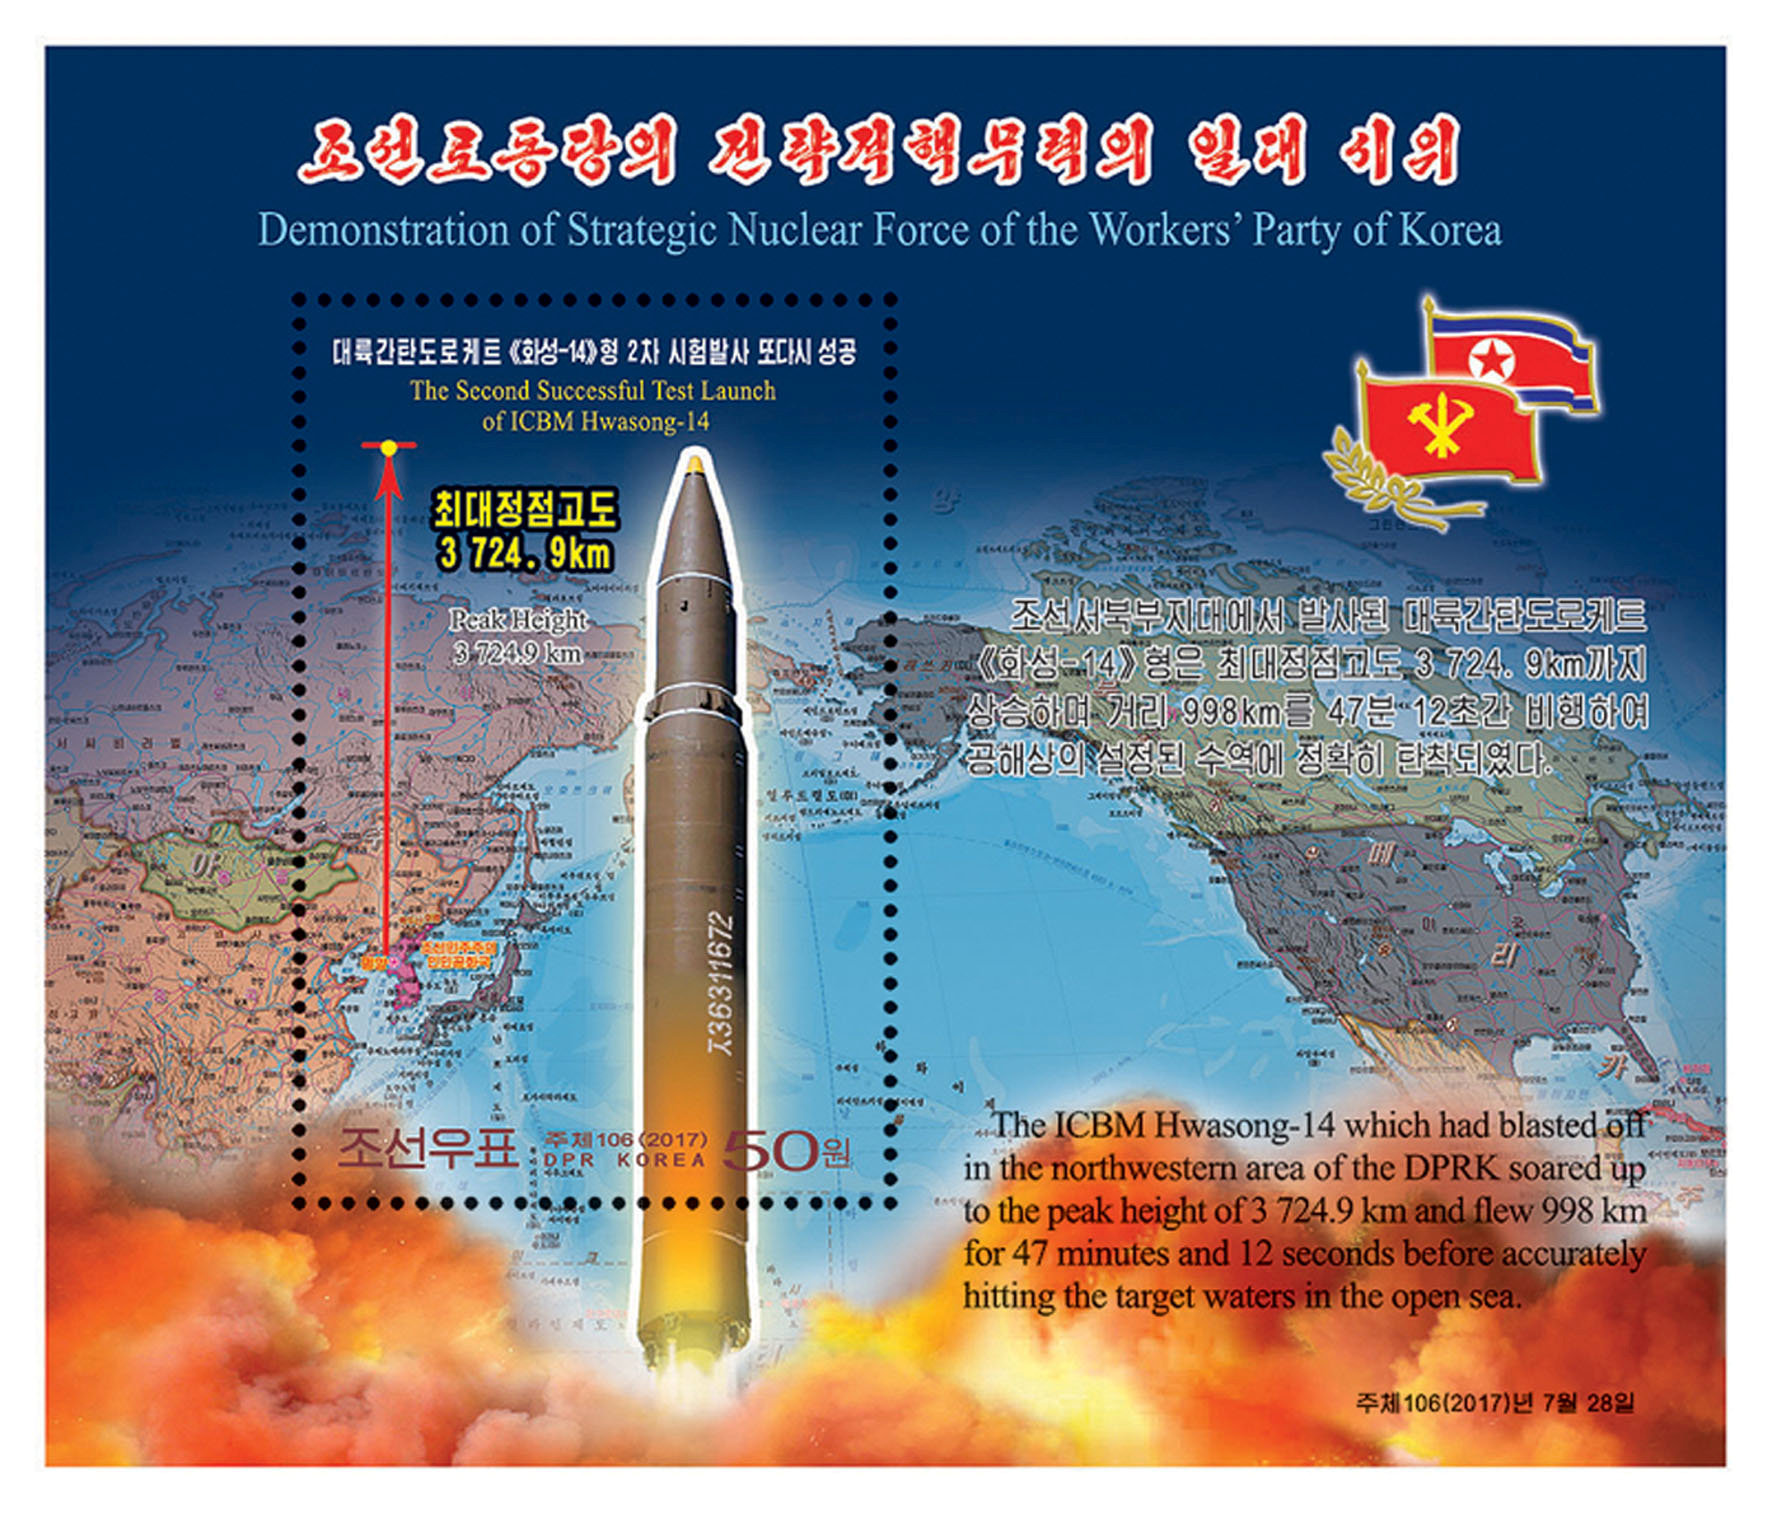 2017-08-31T075708Z_932931328_RC1783AA96C0_RTRMADP_3_NORTHKOREA-MISSILES.JPG